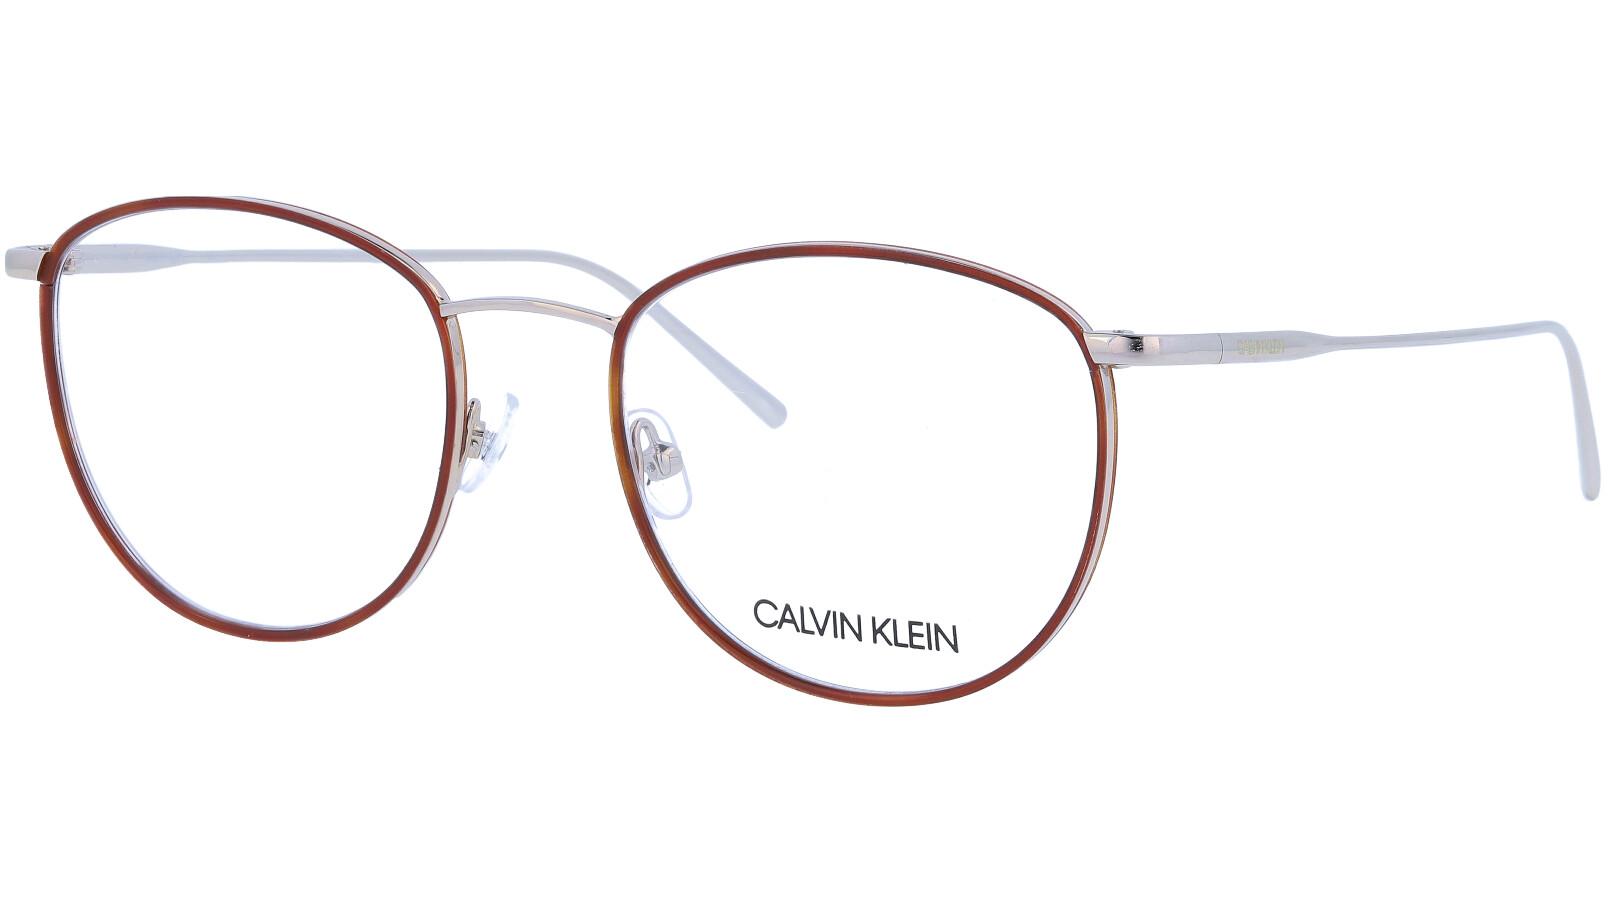 Calvin Klein CK5469 714 52  SilverY Glasses